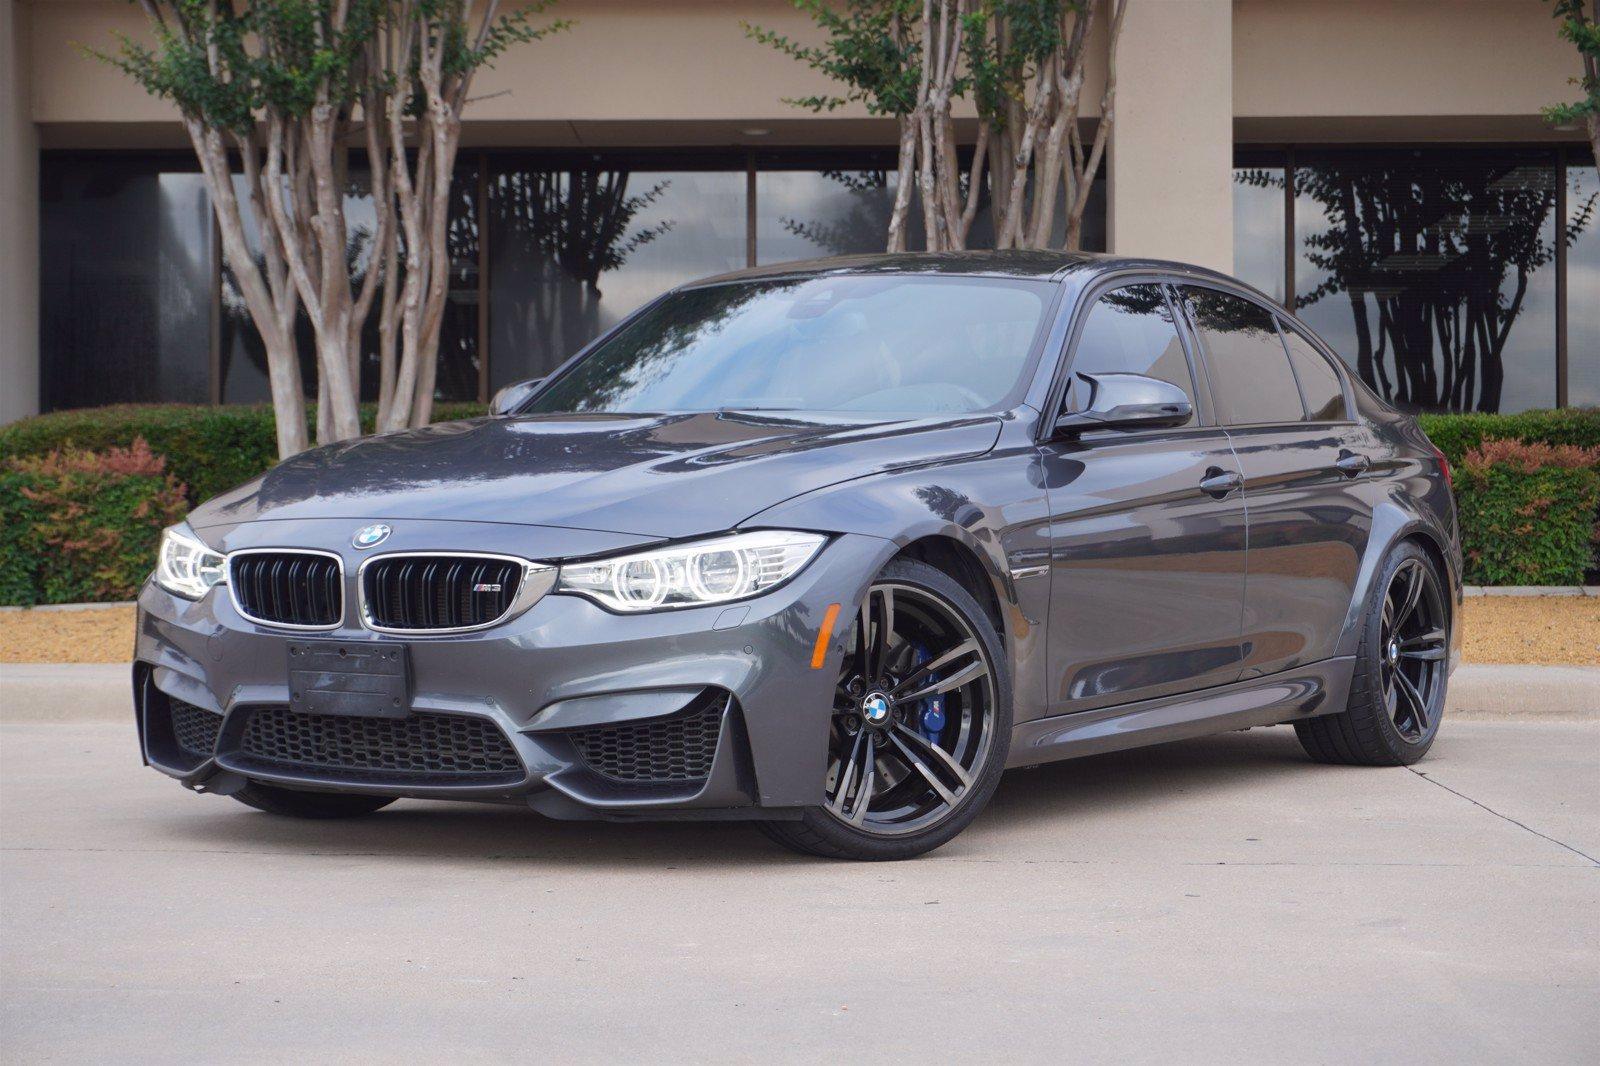 2016 BMW M3 Vehicle Photo in Grapevine, TX 76051